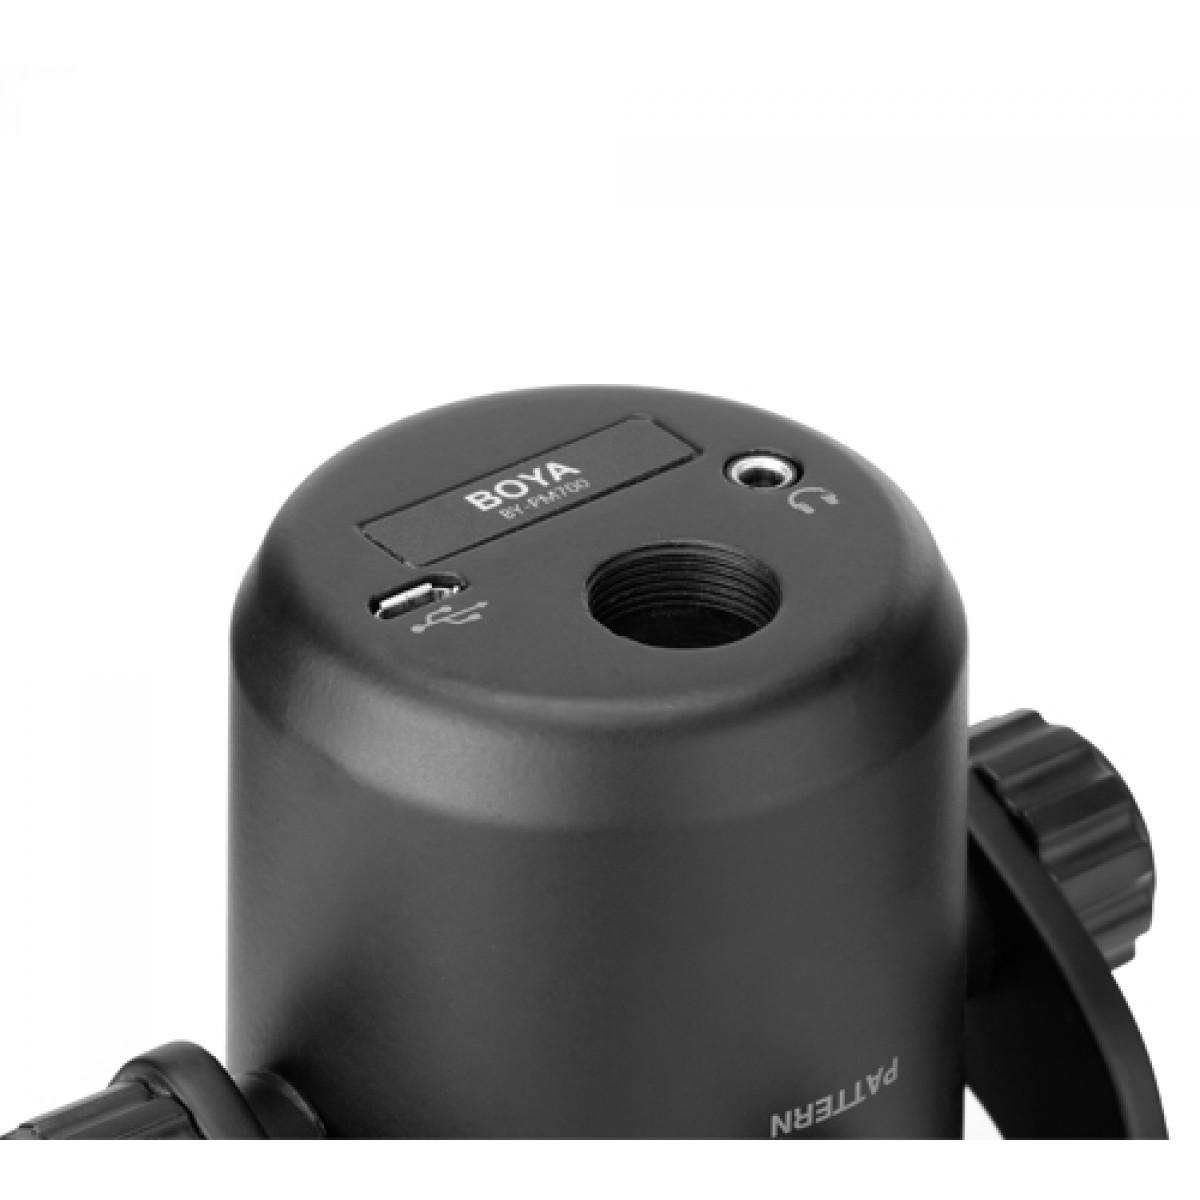 Microfone BOYA BY-PM700, USB, Com Suporte, Black